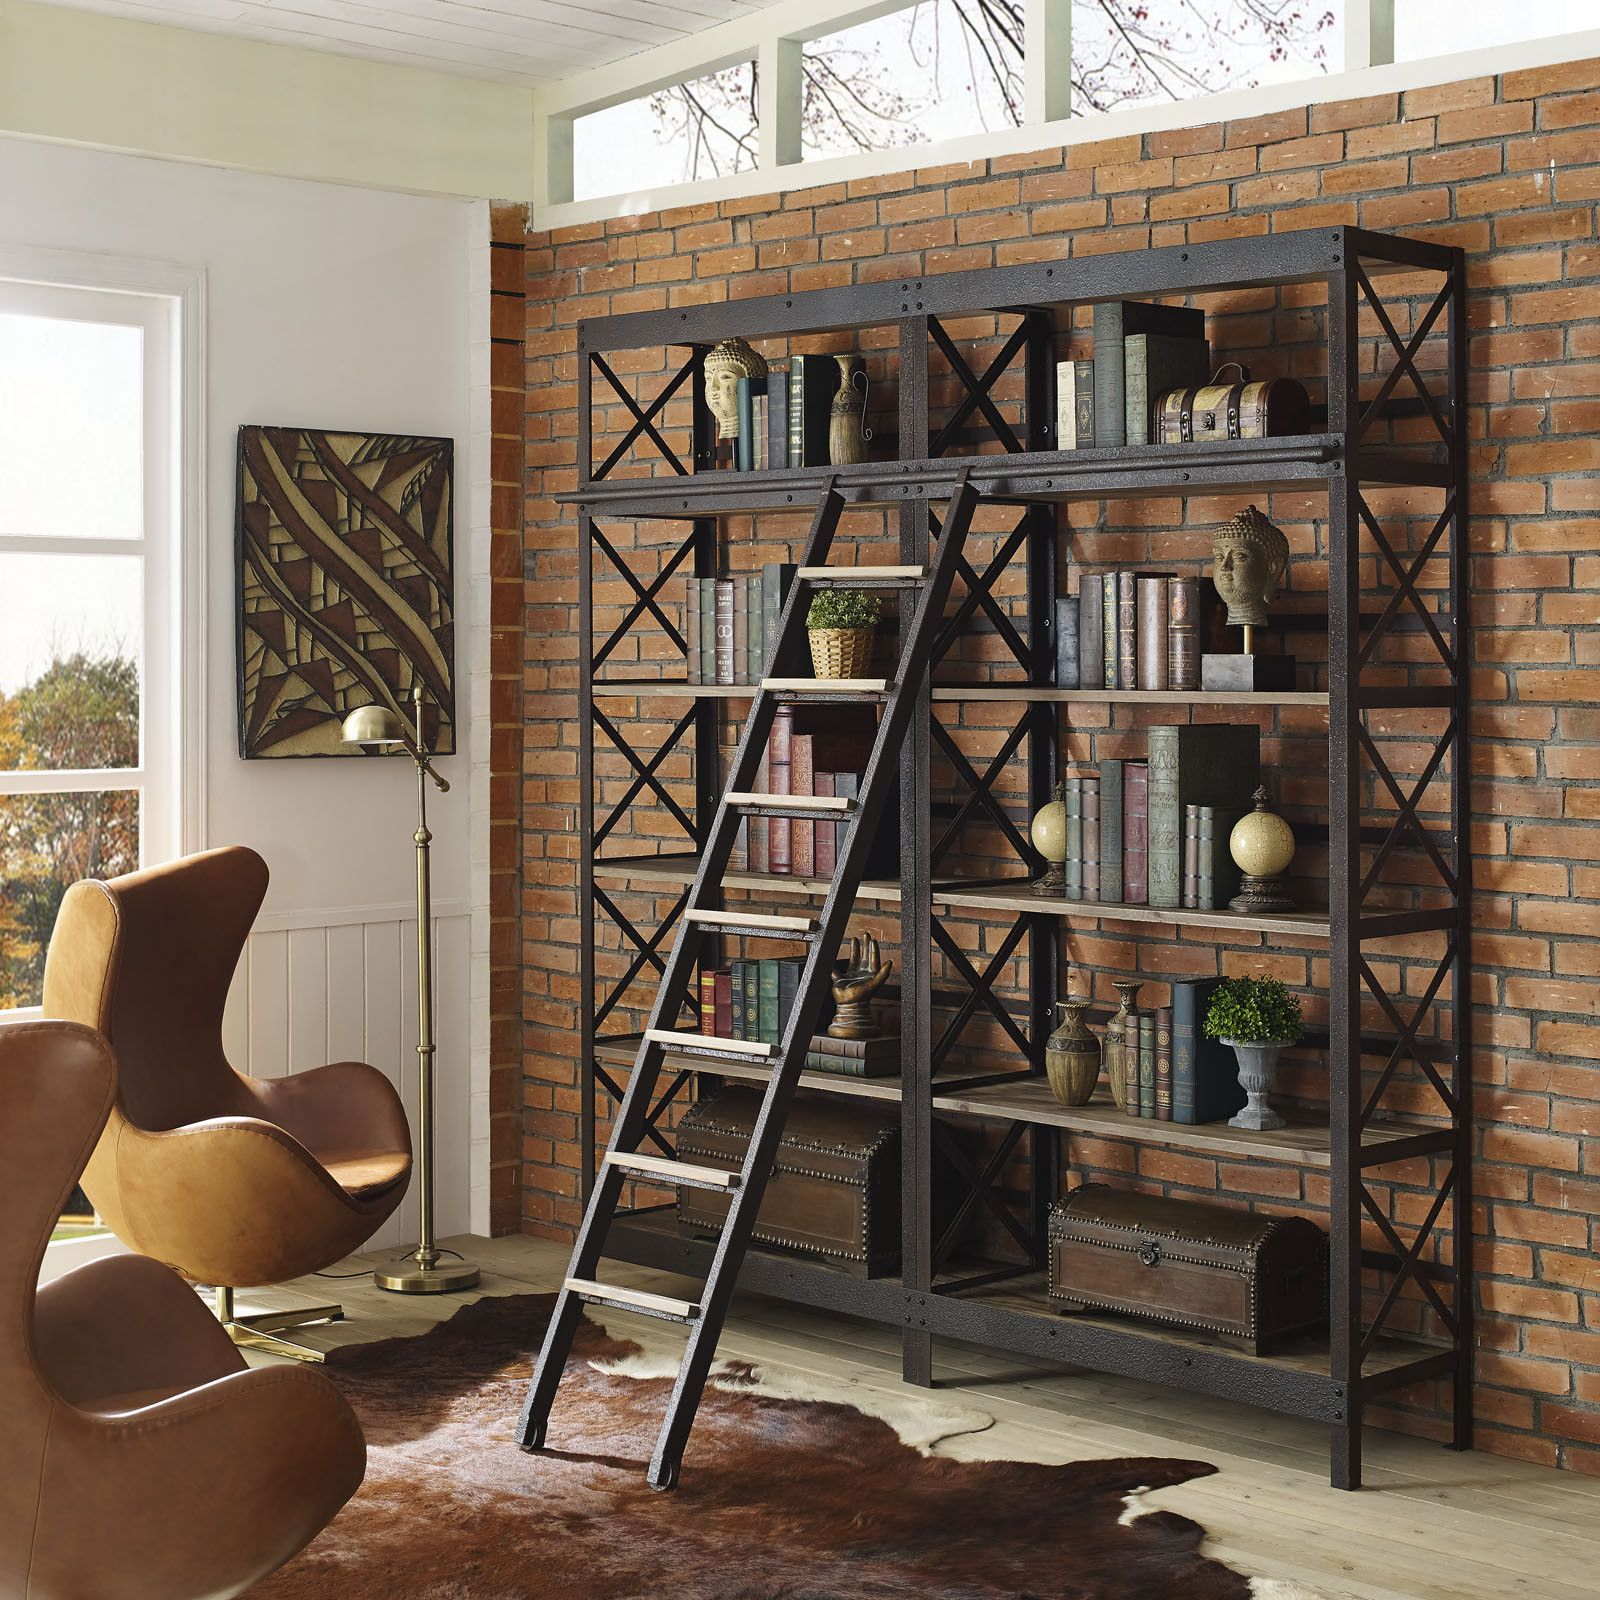 Head wood bookshelf brown wood bookshelves woods and industrial